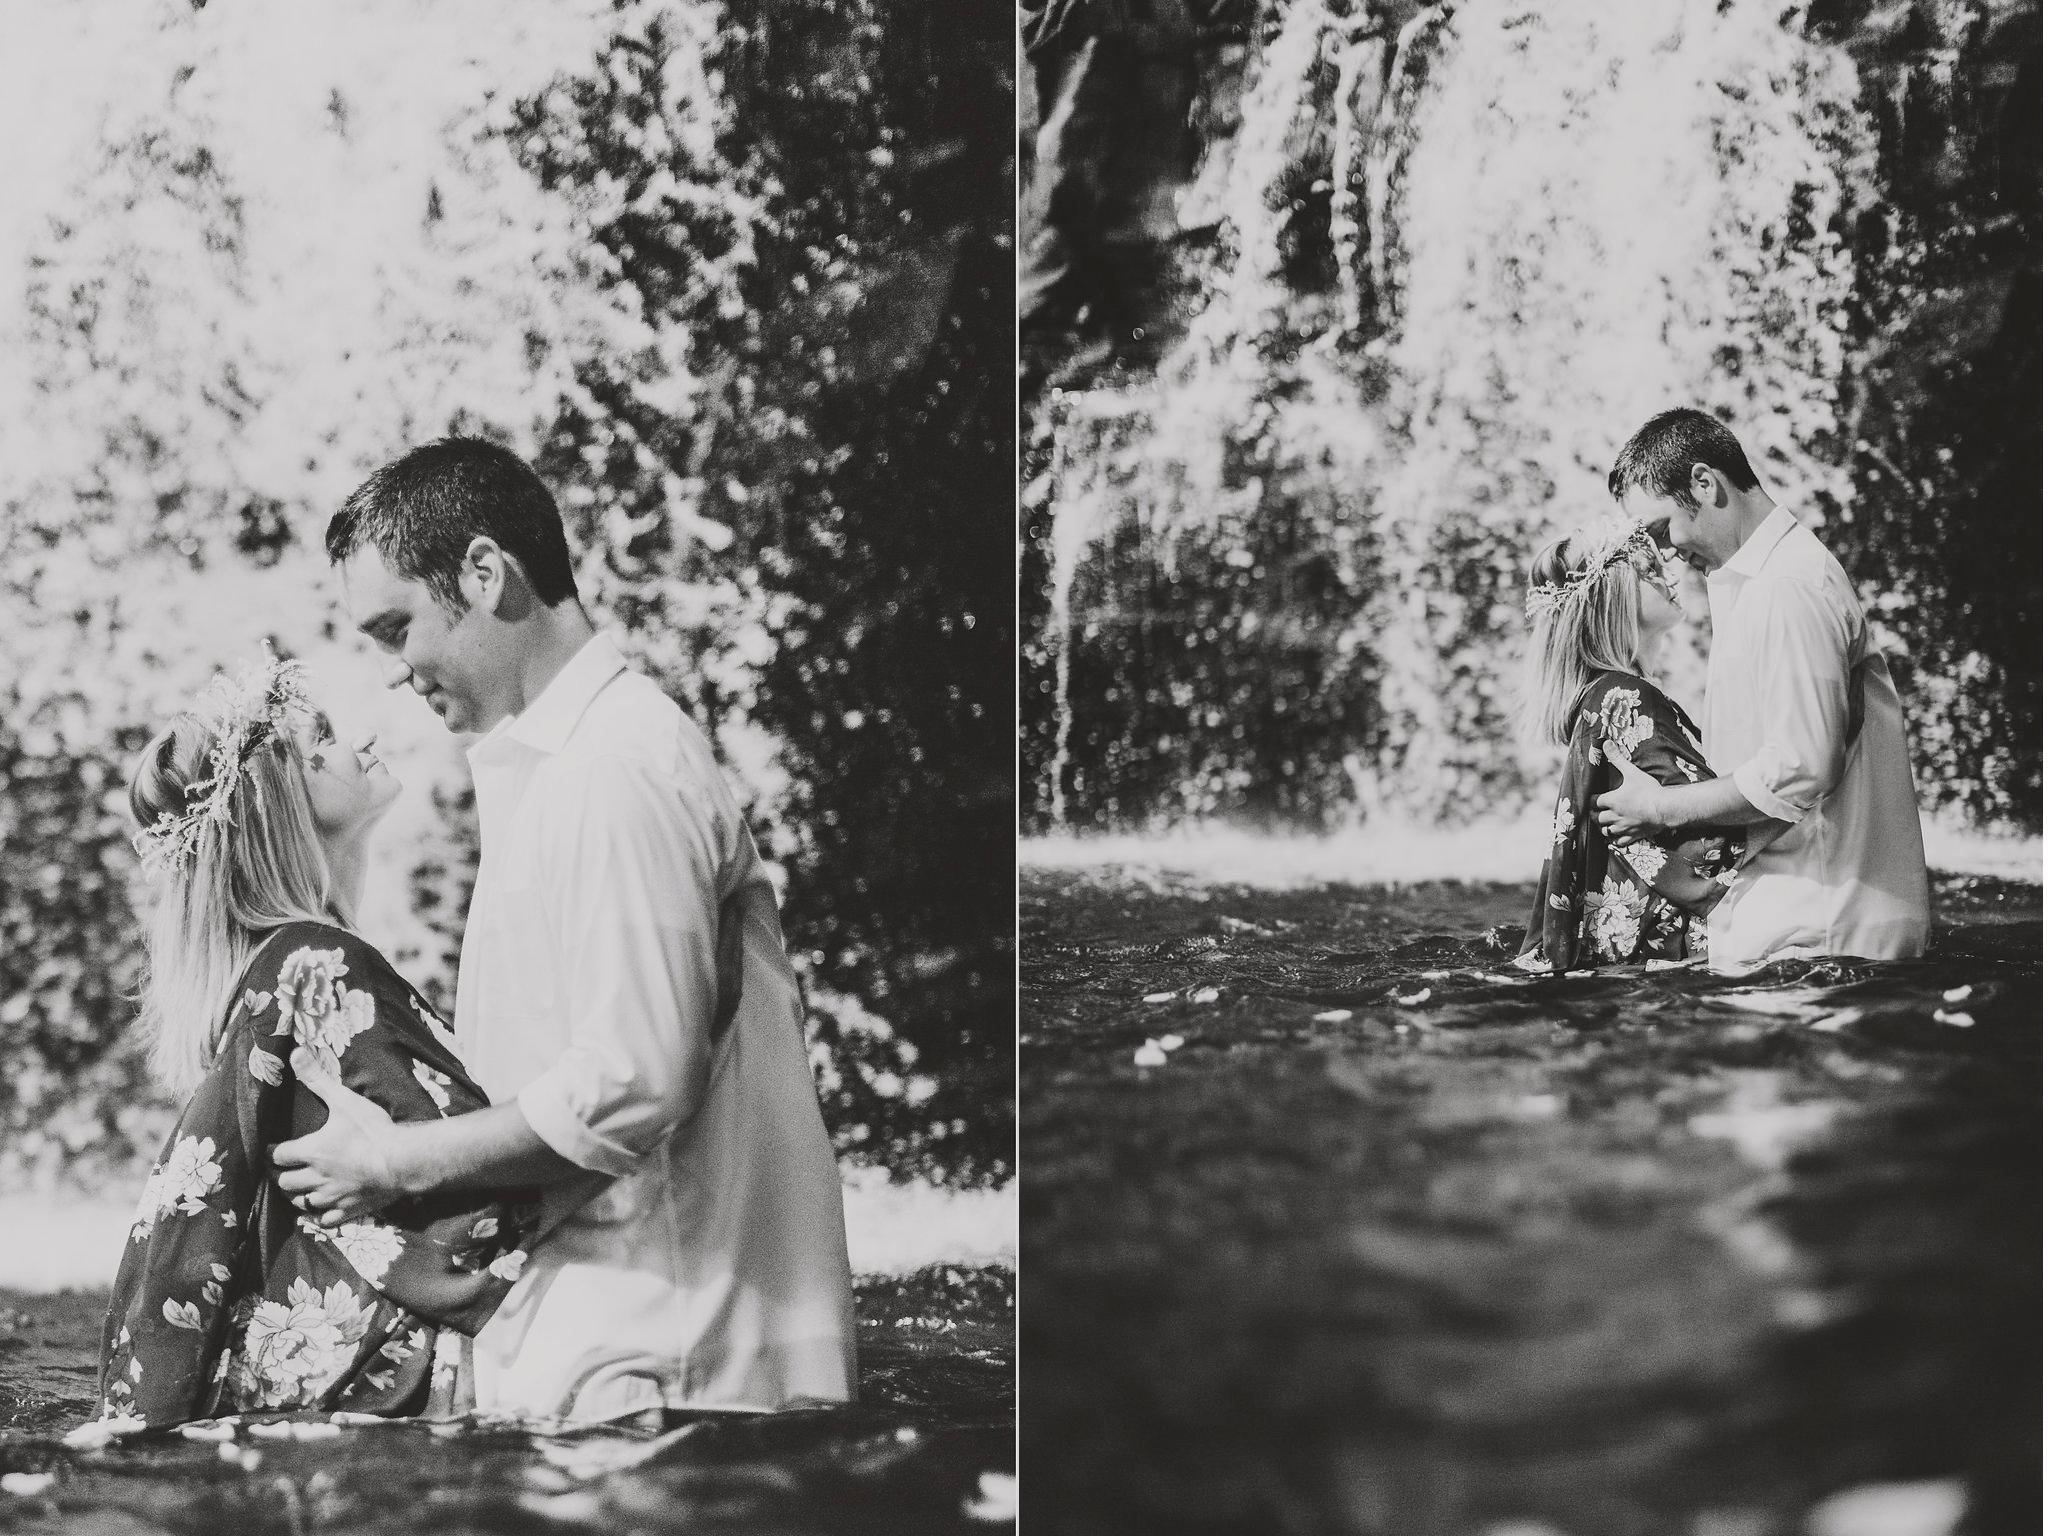 angie-diaz-photography-crisna-brandon-day-after-wedding-21.jpg